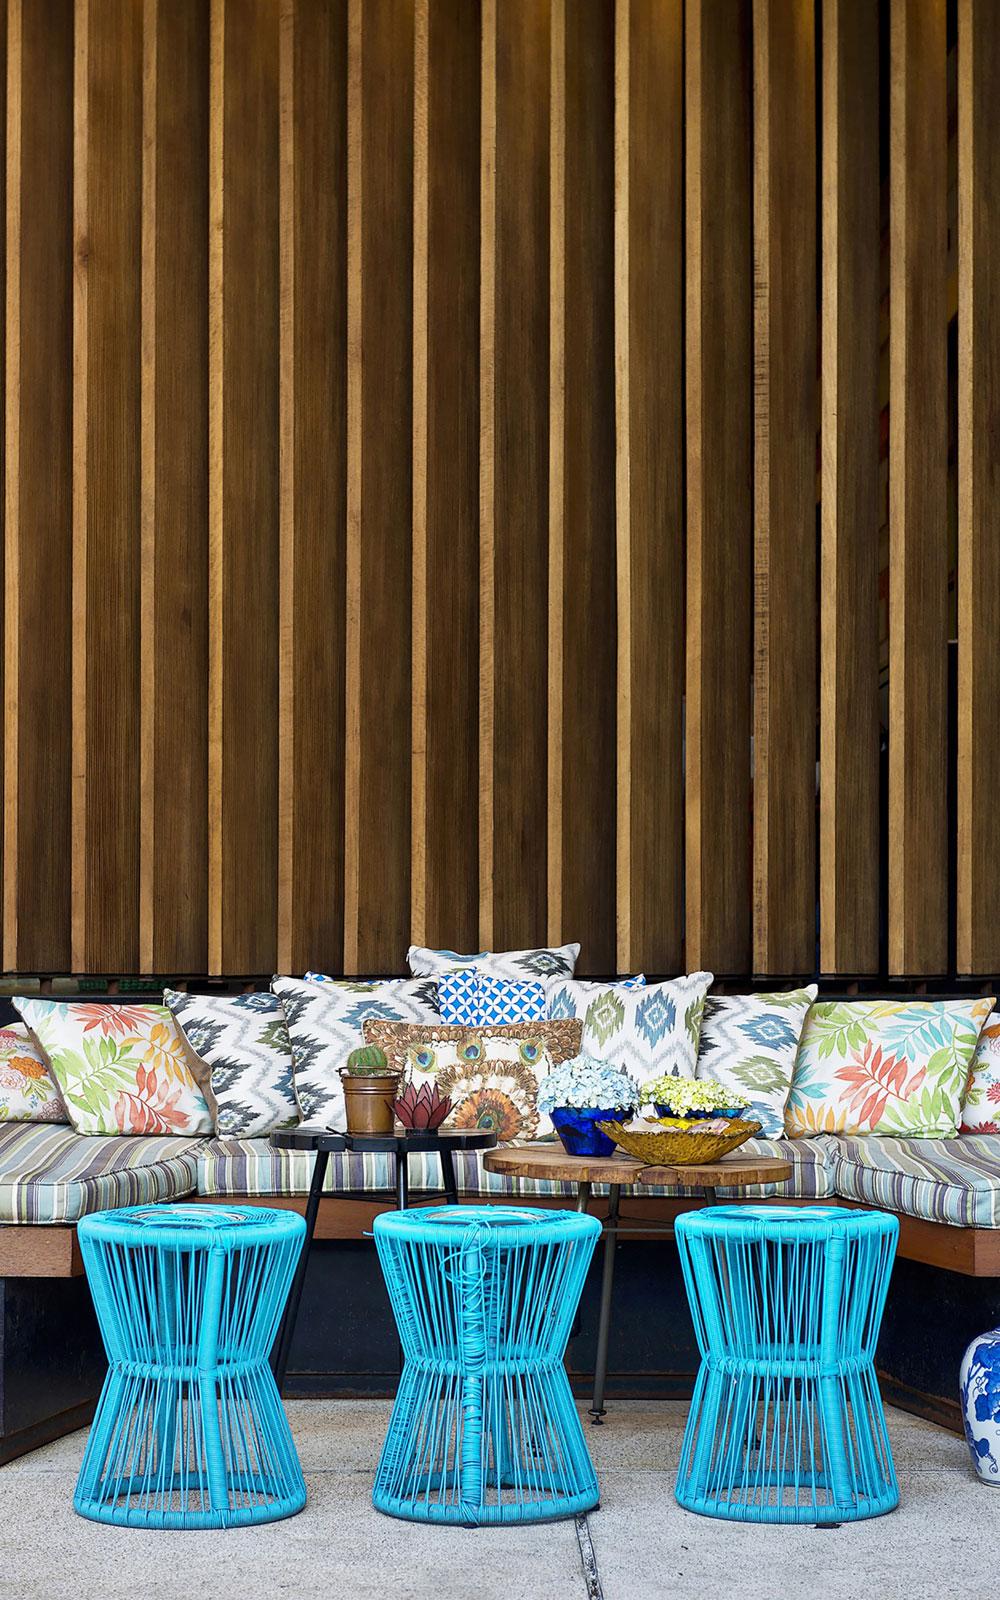 Stylish Tropical Paradise Theme of Lemongrass Restaurant Designed by Einstein & Associates-10